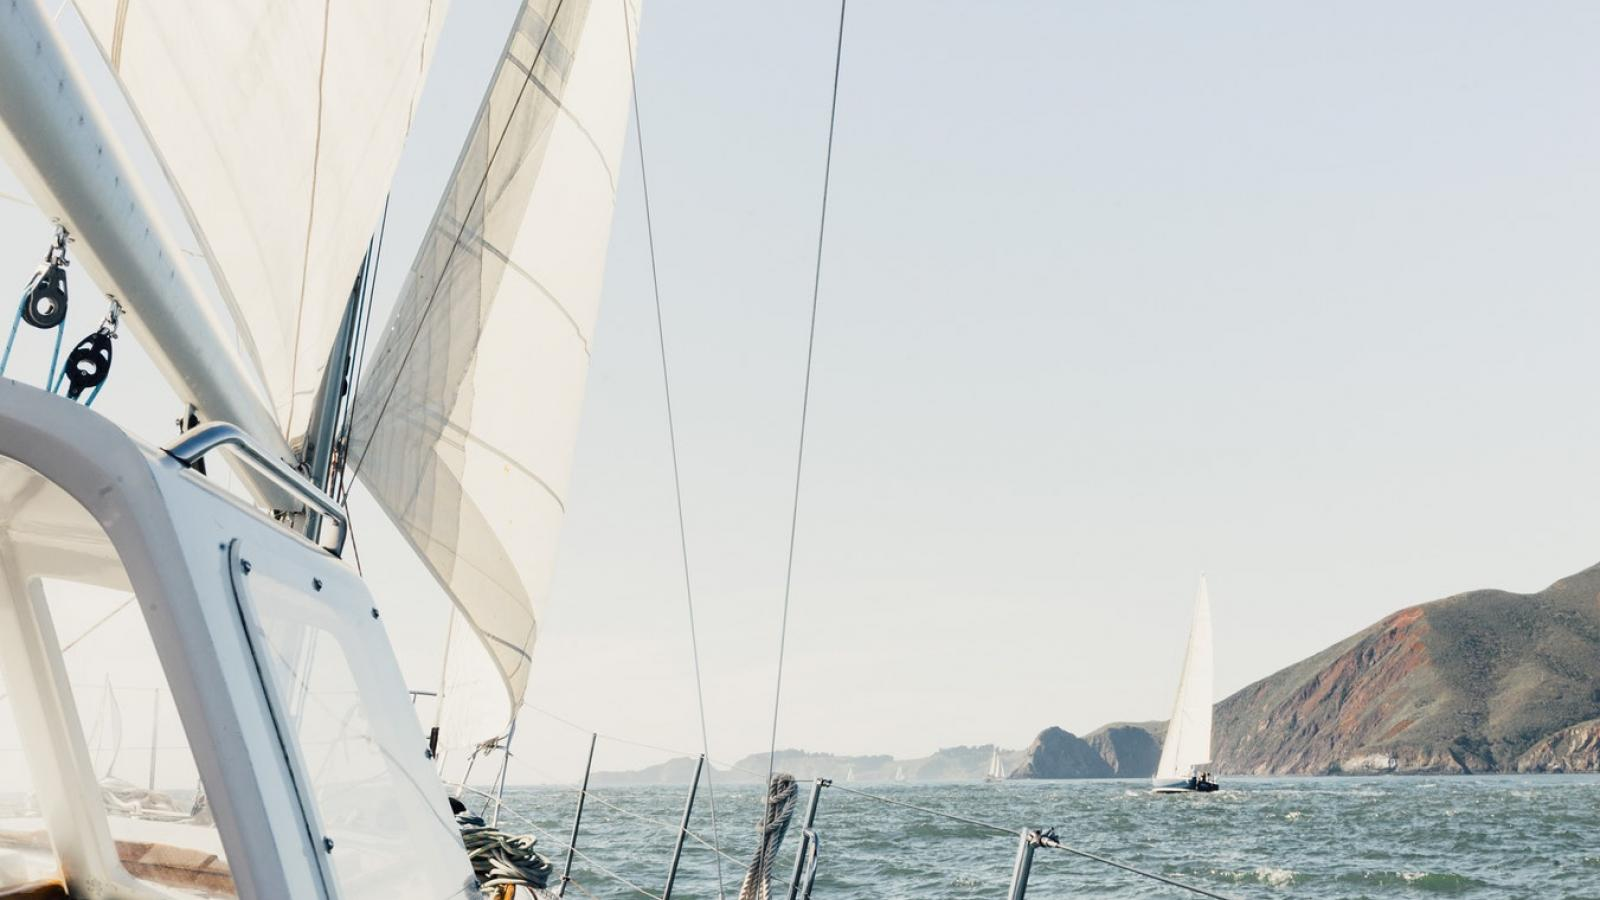 20th anniversary of the Voiles de Saint-Tropez regatta!